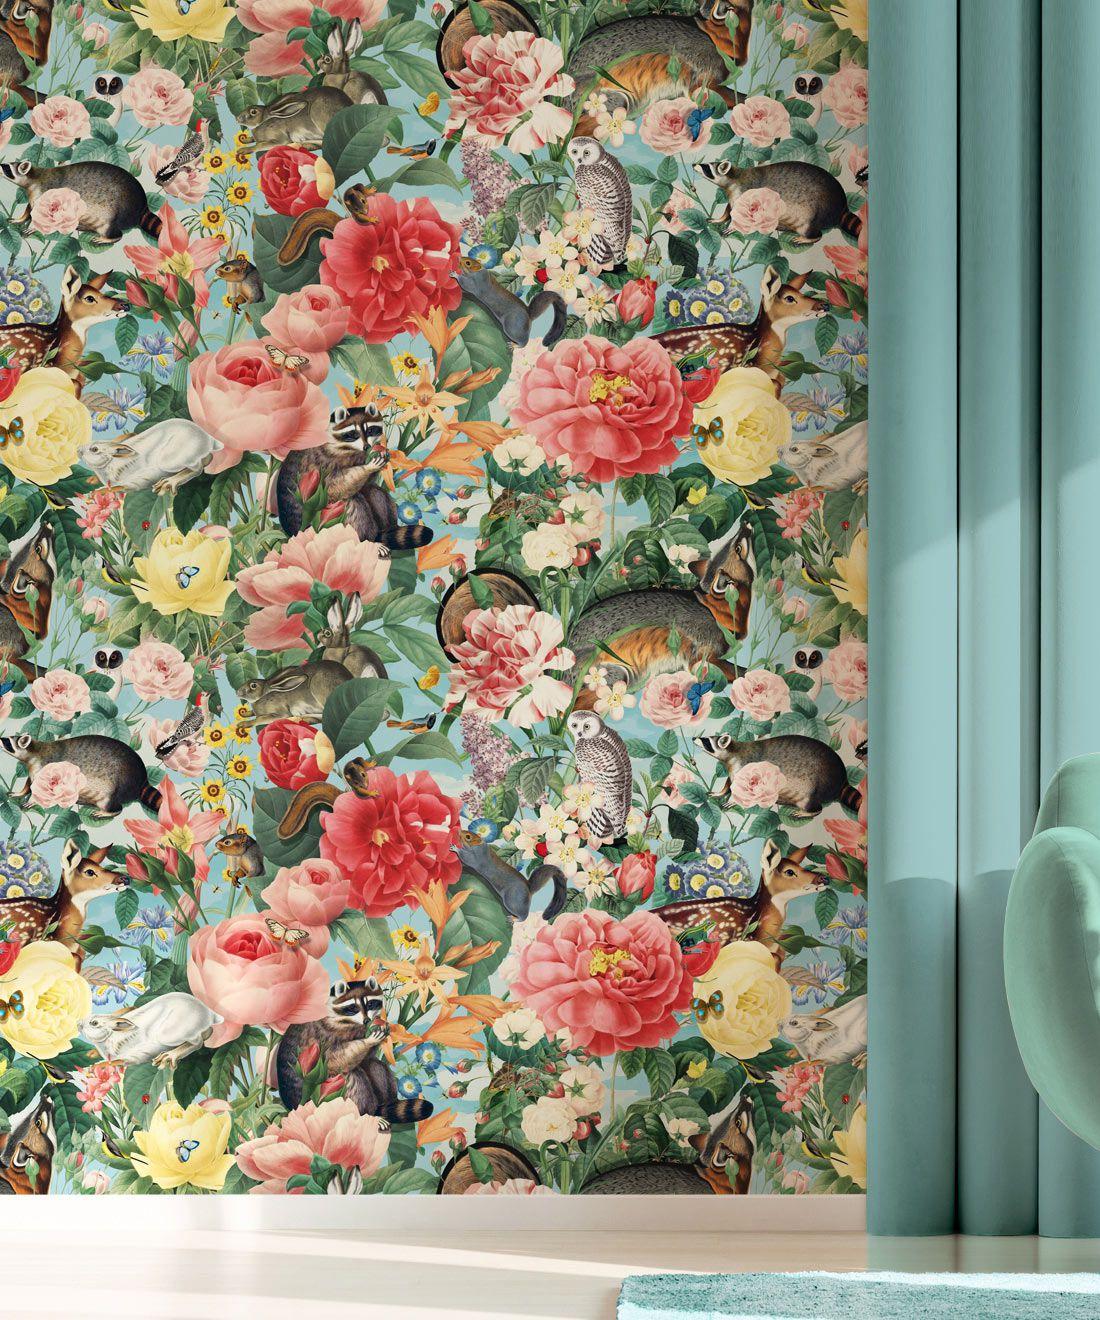 Bush Bouquet Spring Wallpaper • Blue Sky Colored Wallpaper • Assorted Color and Multi-color wallpaper • Floral Wallpaper • Wallpaper With Forest Animals • Insitu